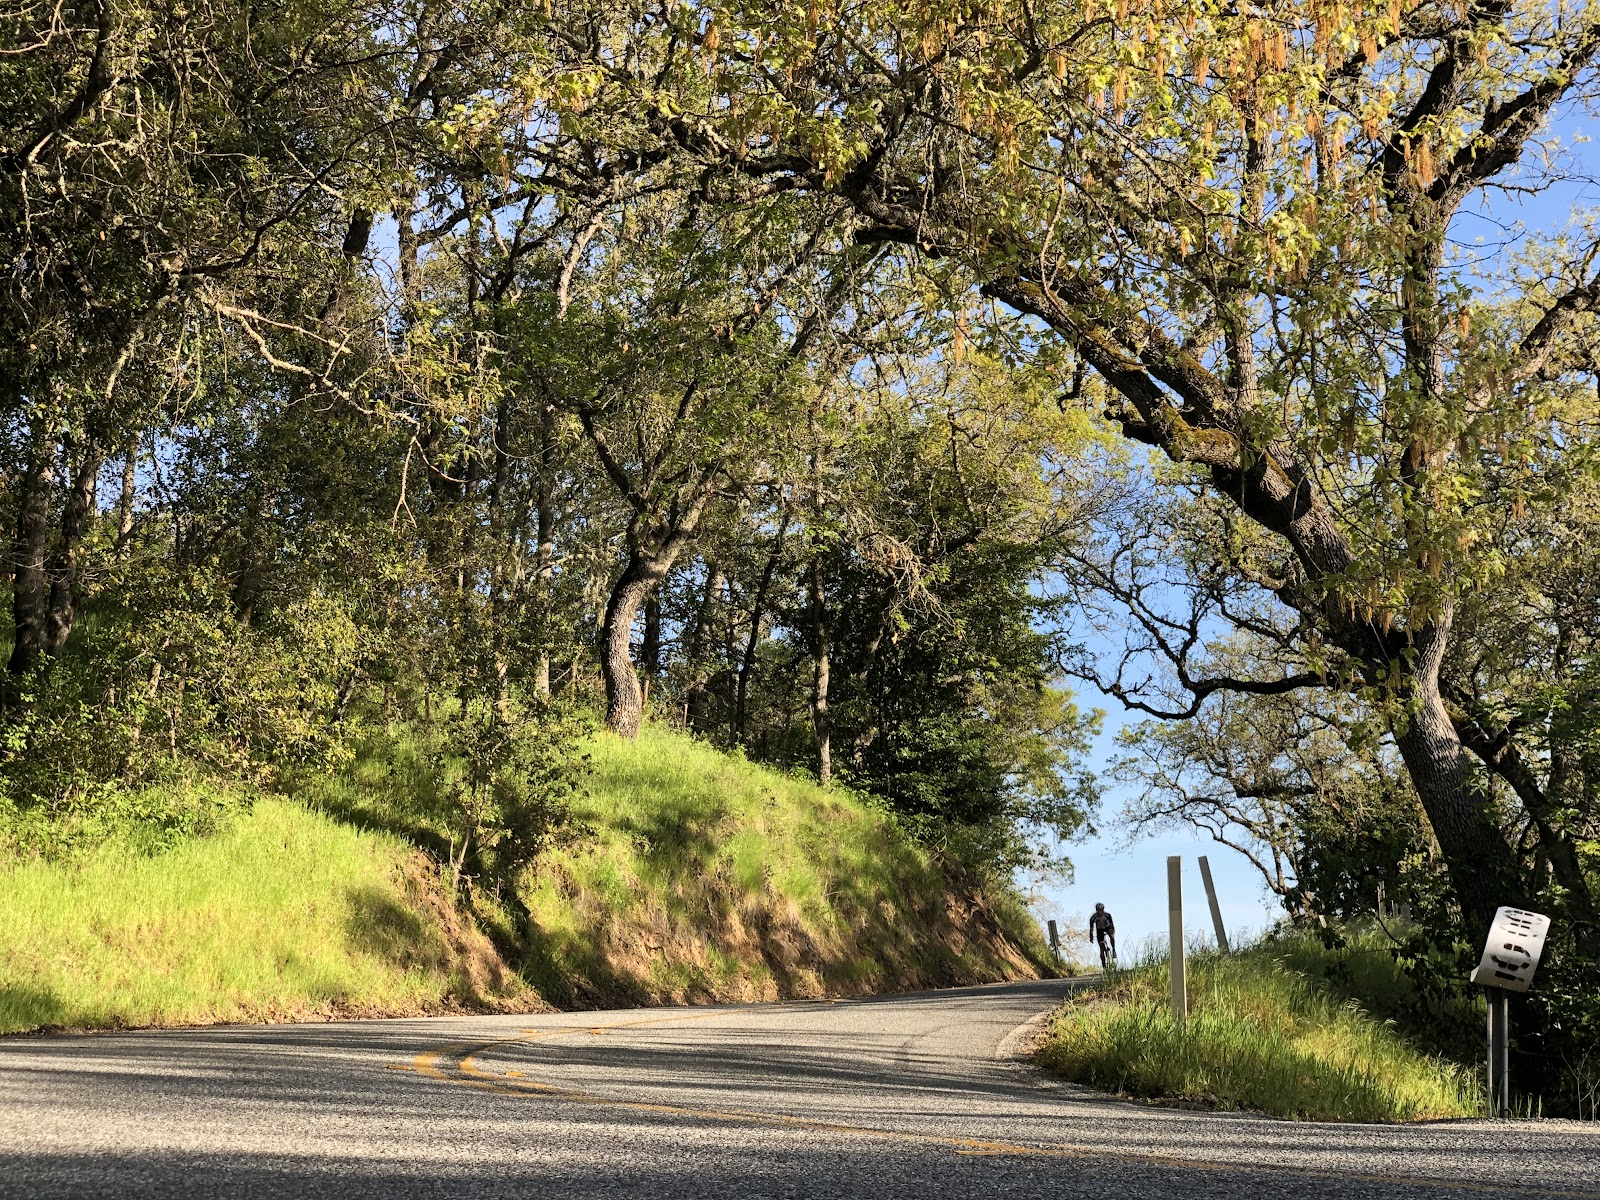 Bicycle ride Mt. Hamilton  - cyclist descending through trees